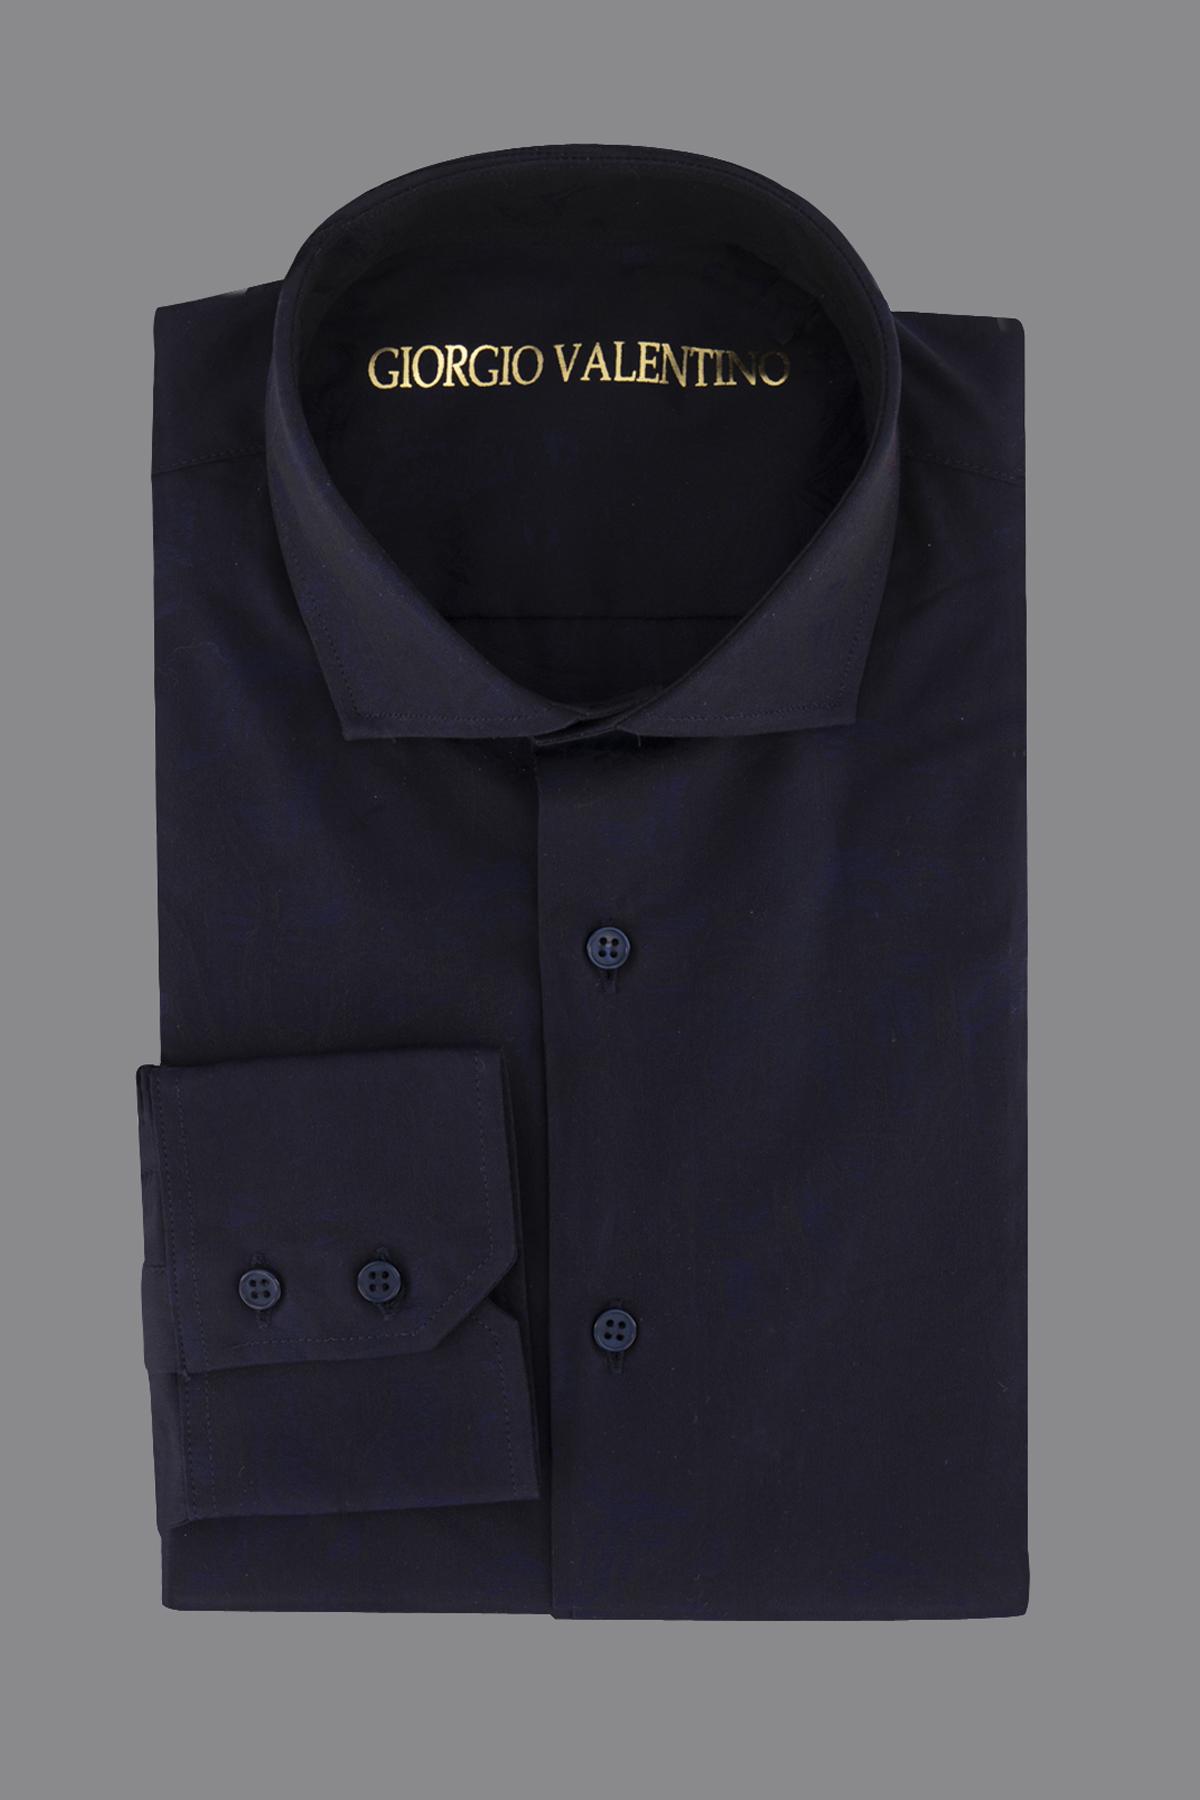 Camisa Giorgio Valentino, tela italiana, slim fit, jacquard azul.